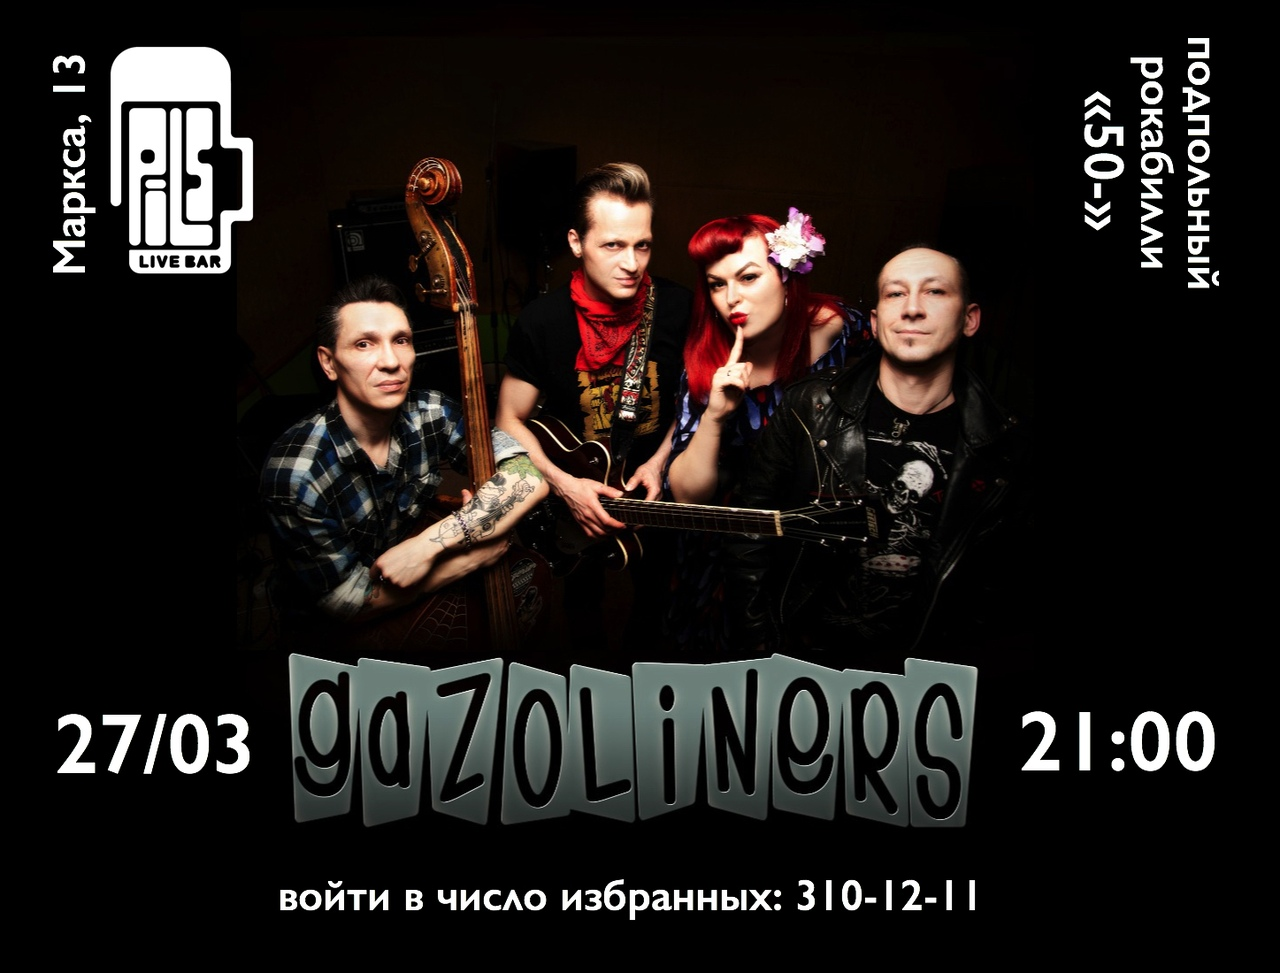 27.03 Gazoliners в Pils Live Bar!